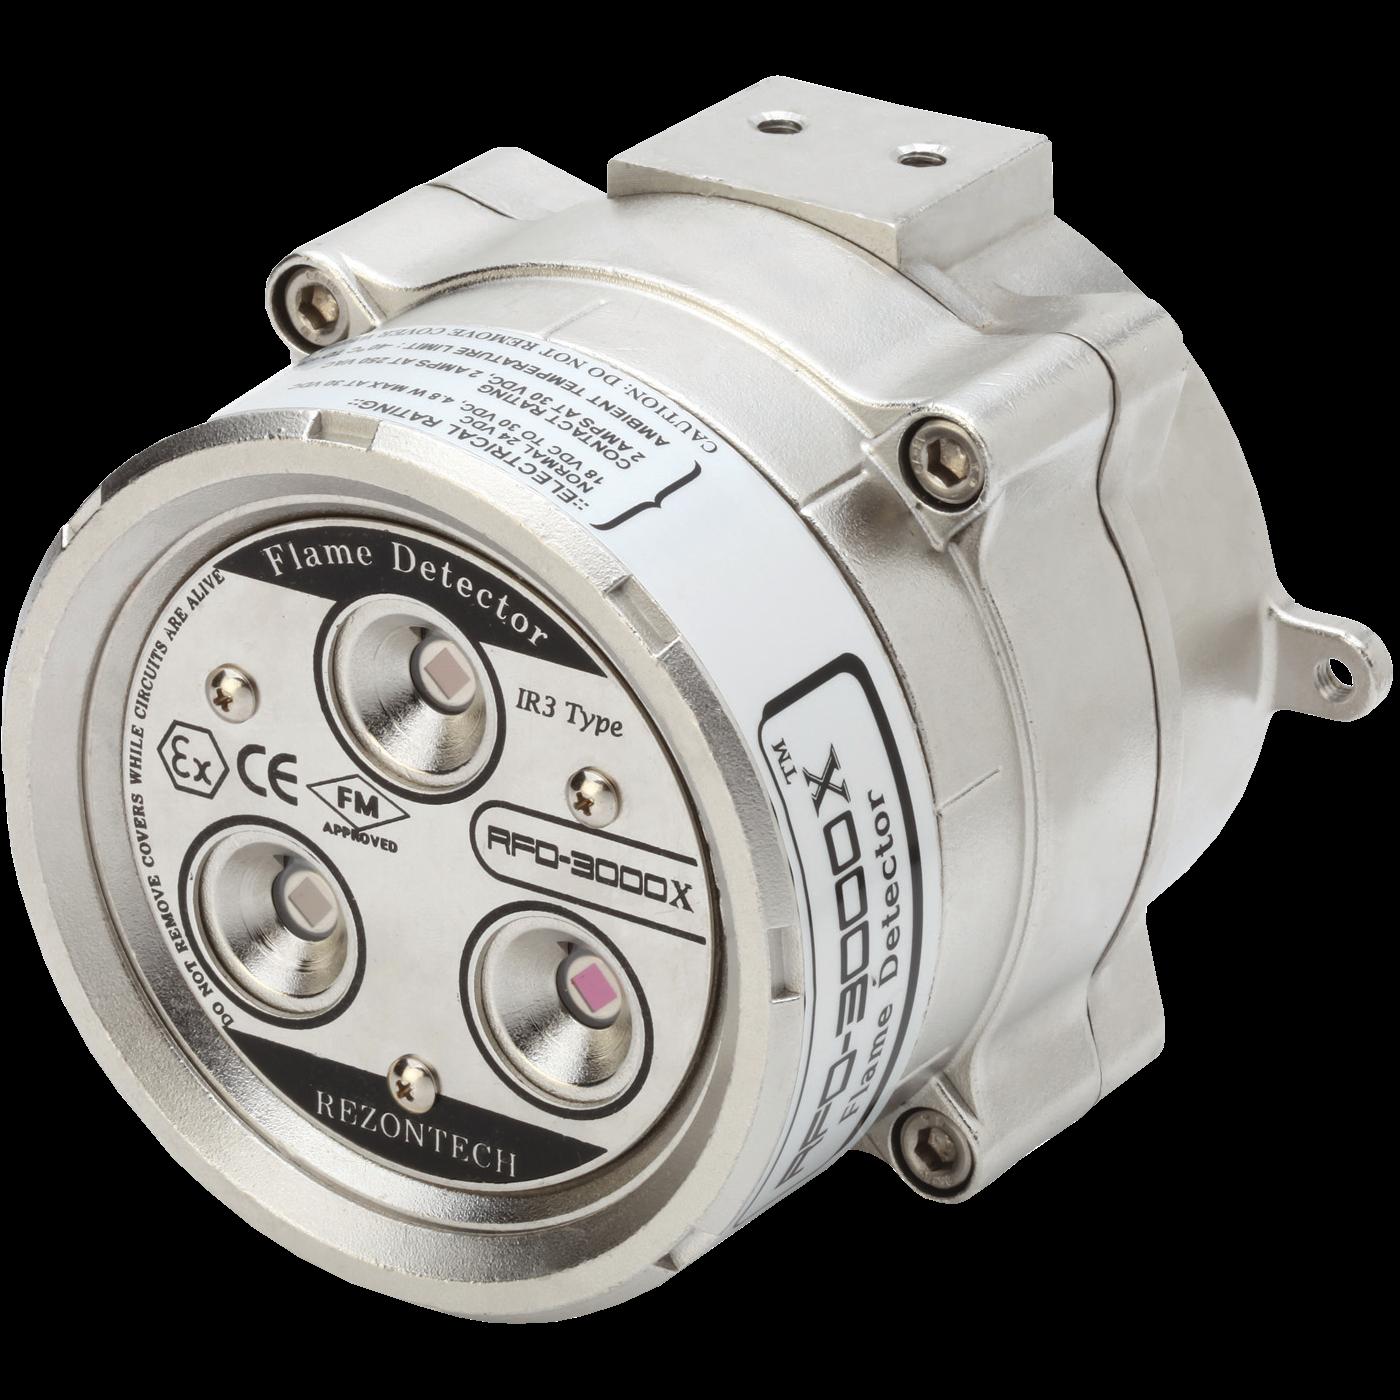 rfd-3000x Razontech flame detector